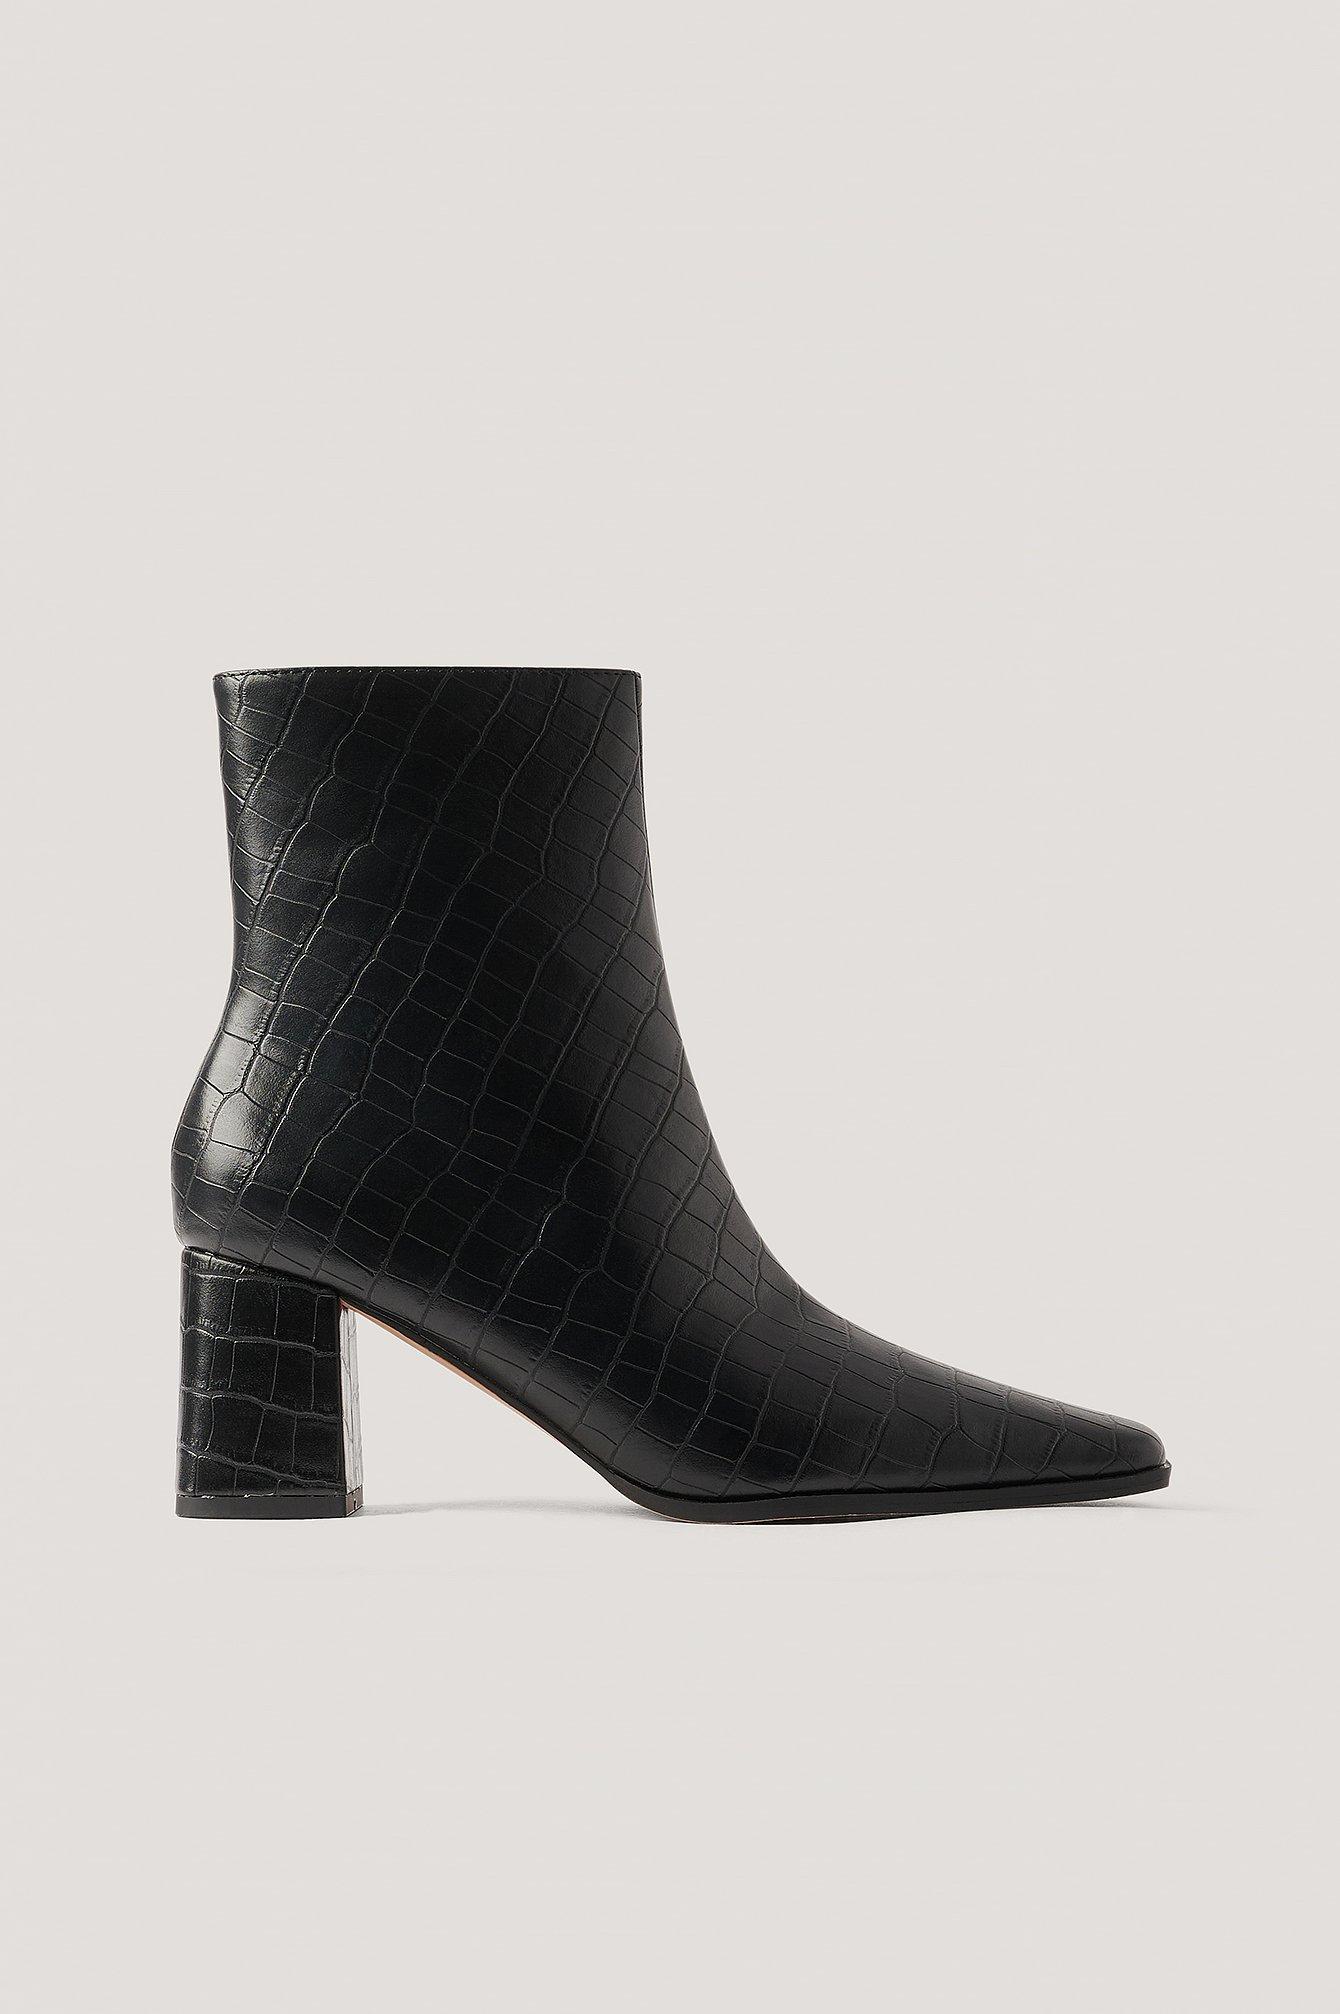 Na-Kd Shoes Croc Slim Squared Toe Boots - Black